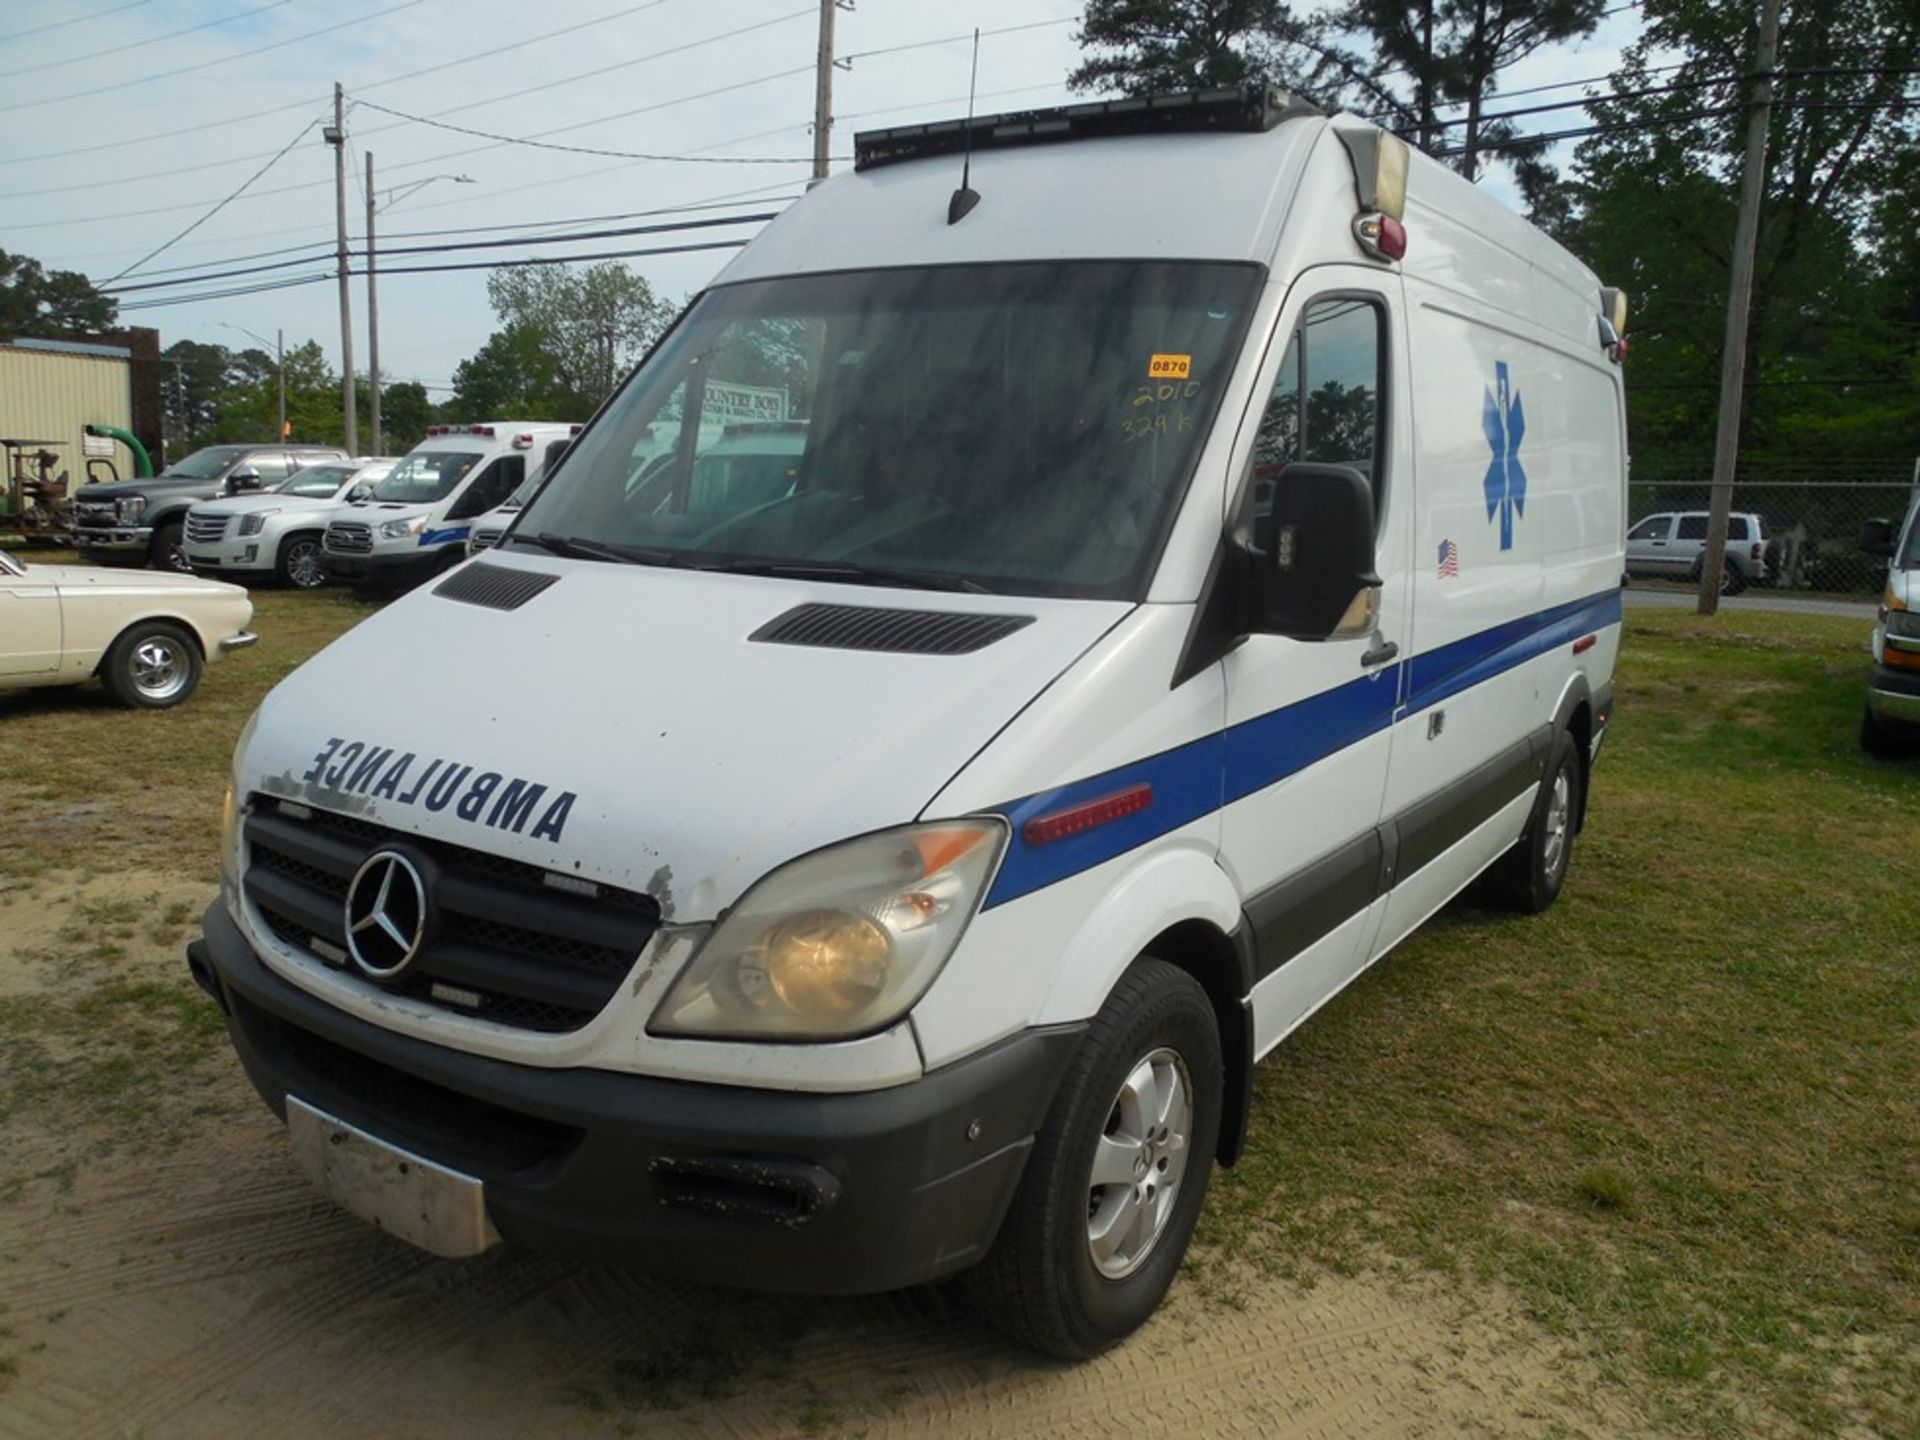 2010 Mercedes Sprinter dsl, ambulance 329,856 miles vin# WD3PE7CCXA5476270 - Image 2 of 6